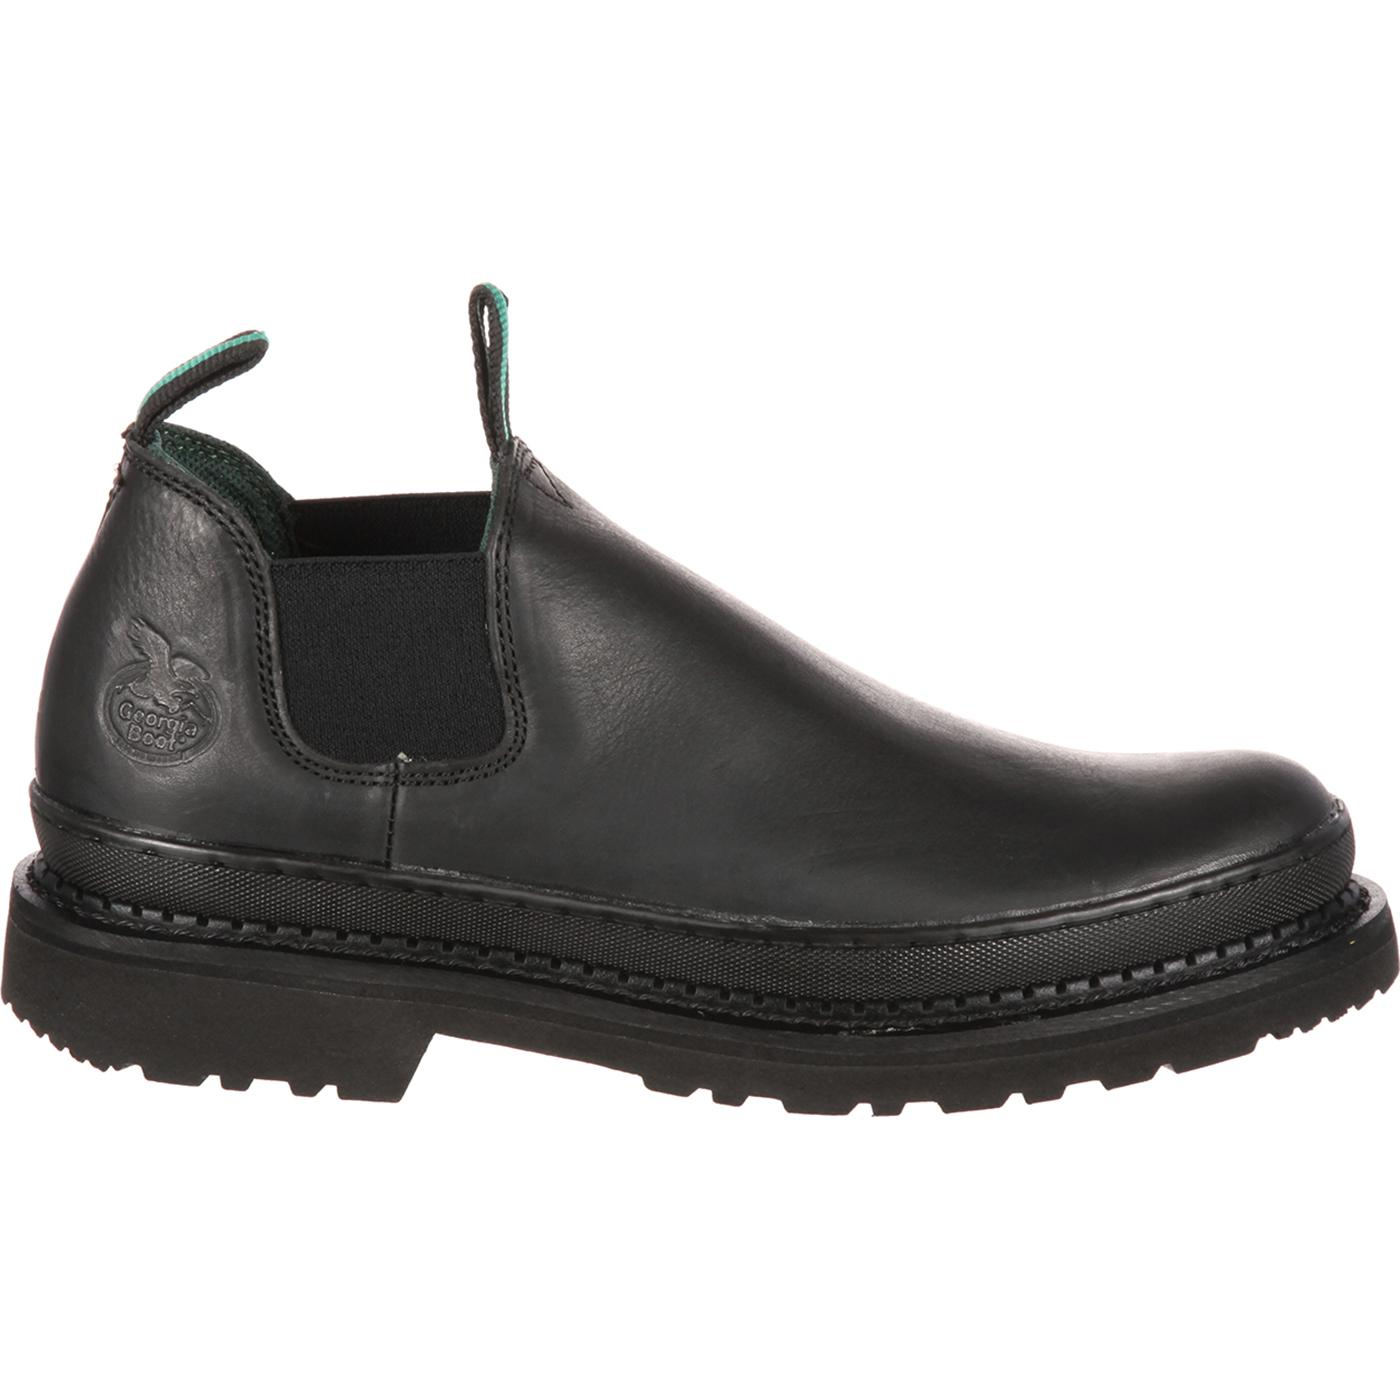 in waterproof work s challenger for concrete men boot dickies best top reviews picks with boots floors fbk fr depth shoes